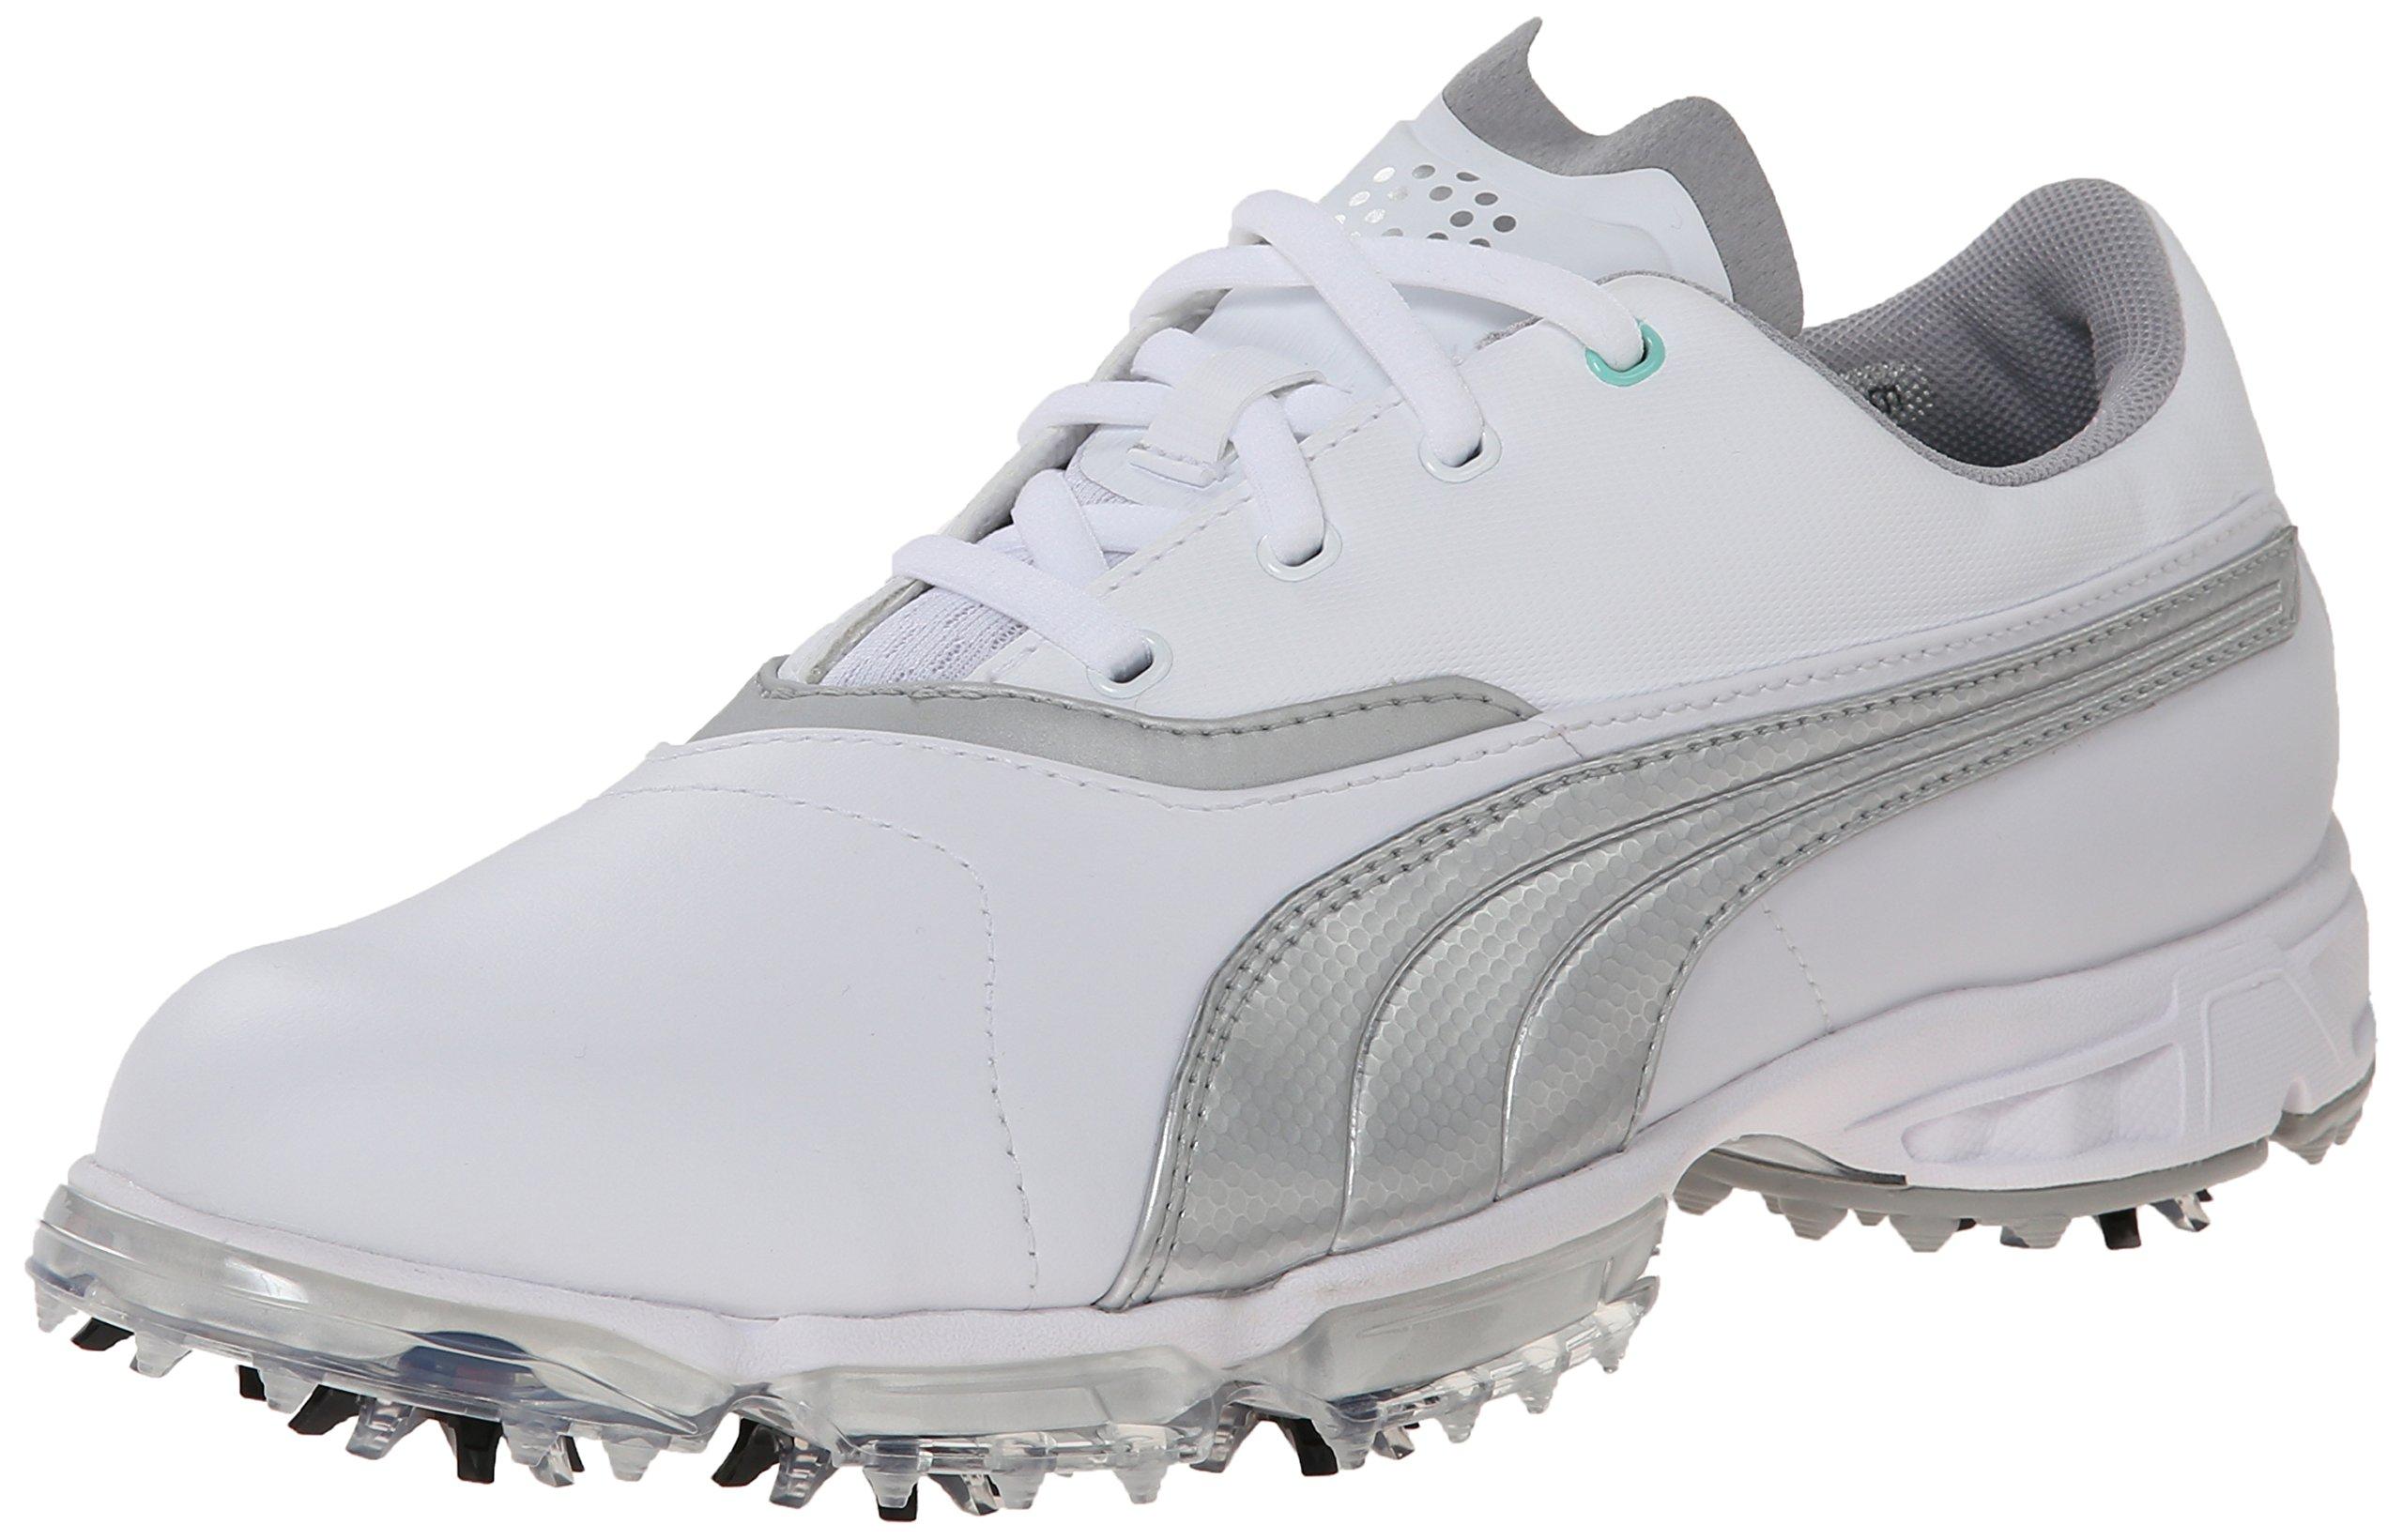 PUMA Women's Biopro Golf Shoe Spiked, White/Silver Metallic, 7.5 M US